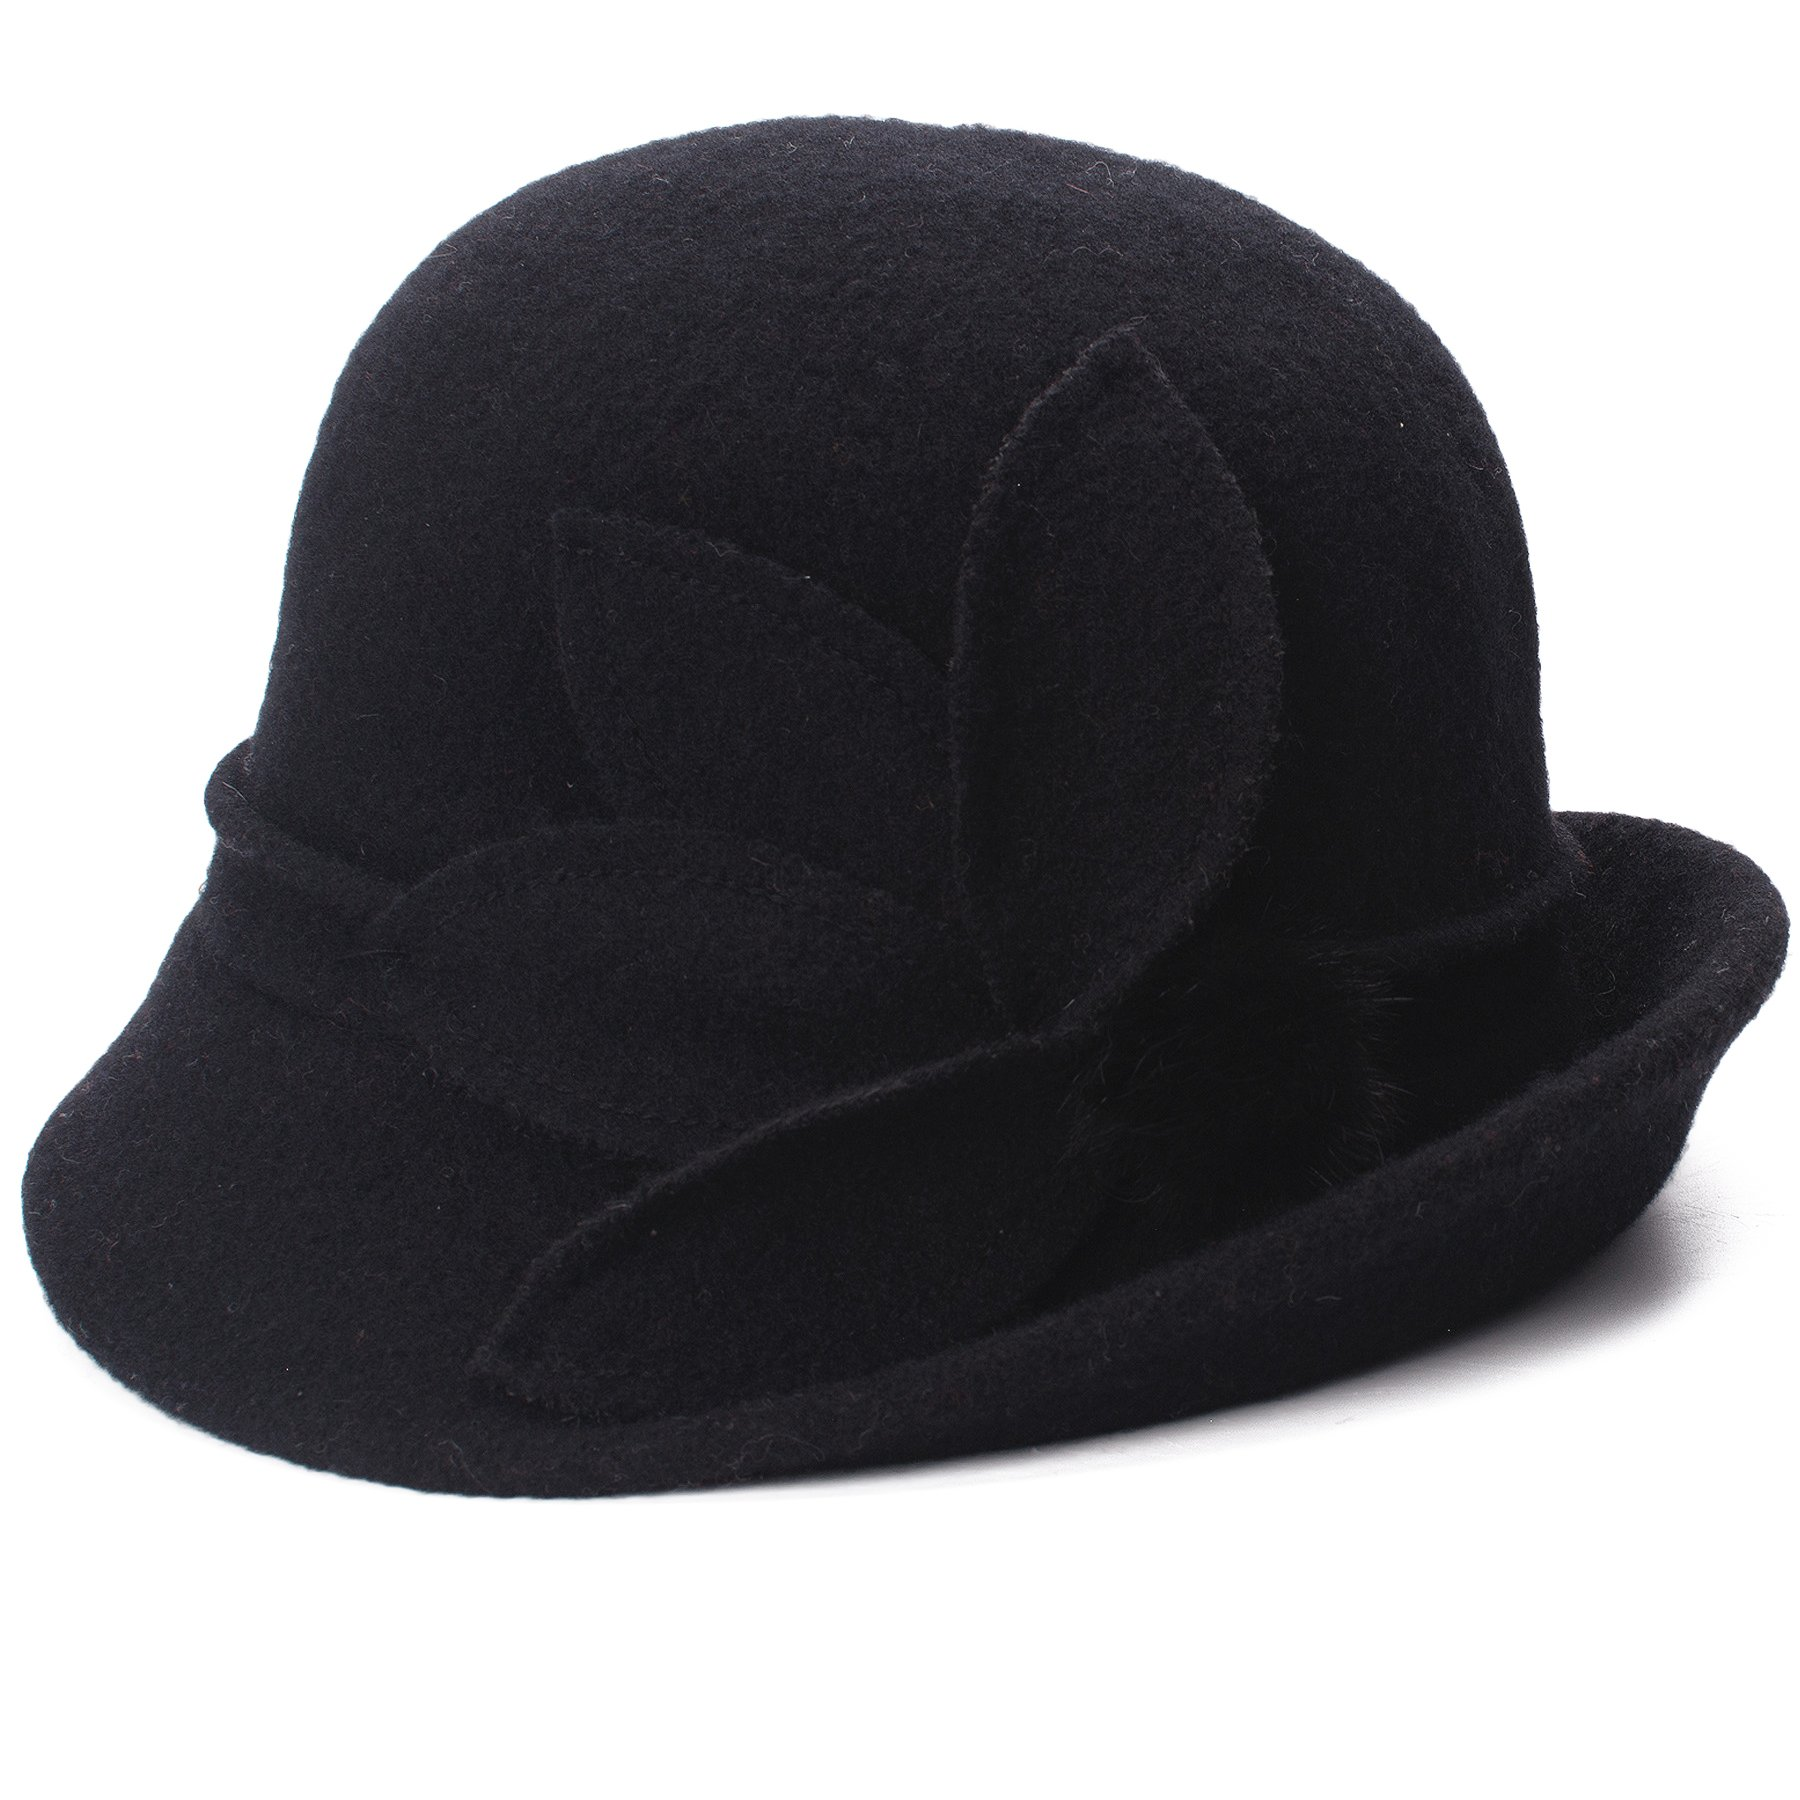 Lawliet Womens Retro Upturn Brim Wool Blend Cloche Church Wedding Hat A474 (Black)